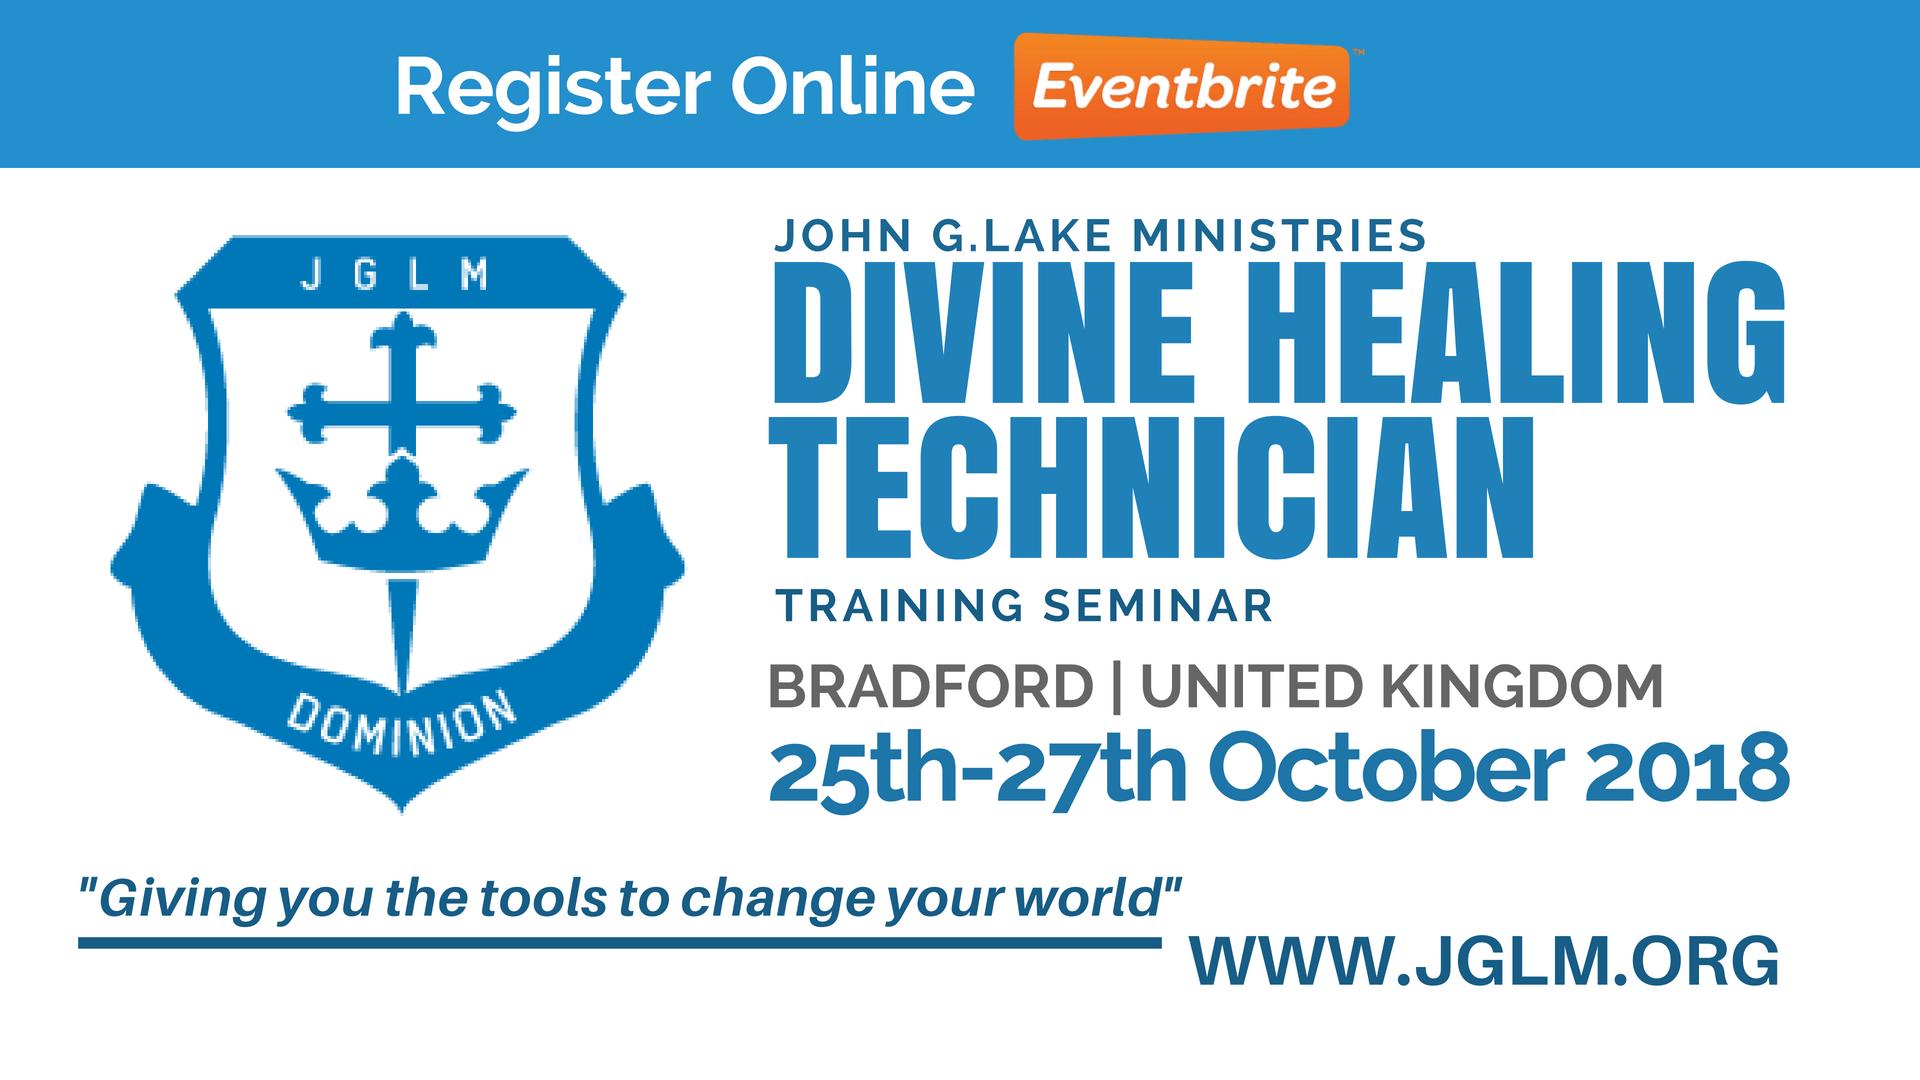 Bradford John G. Lake Ministries Divine Healing Technician Training Seminar